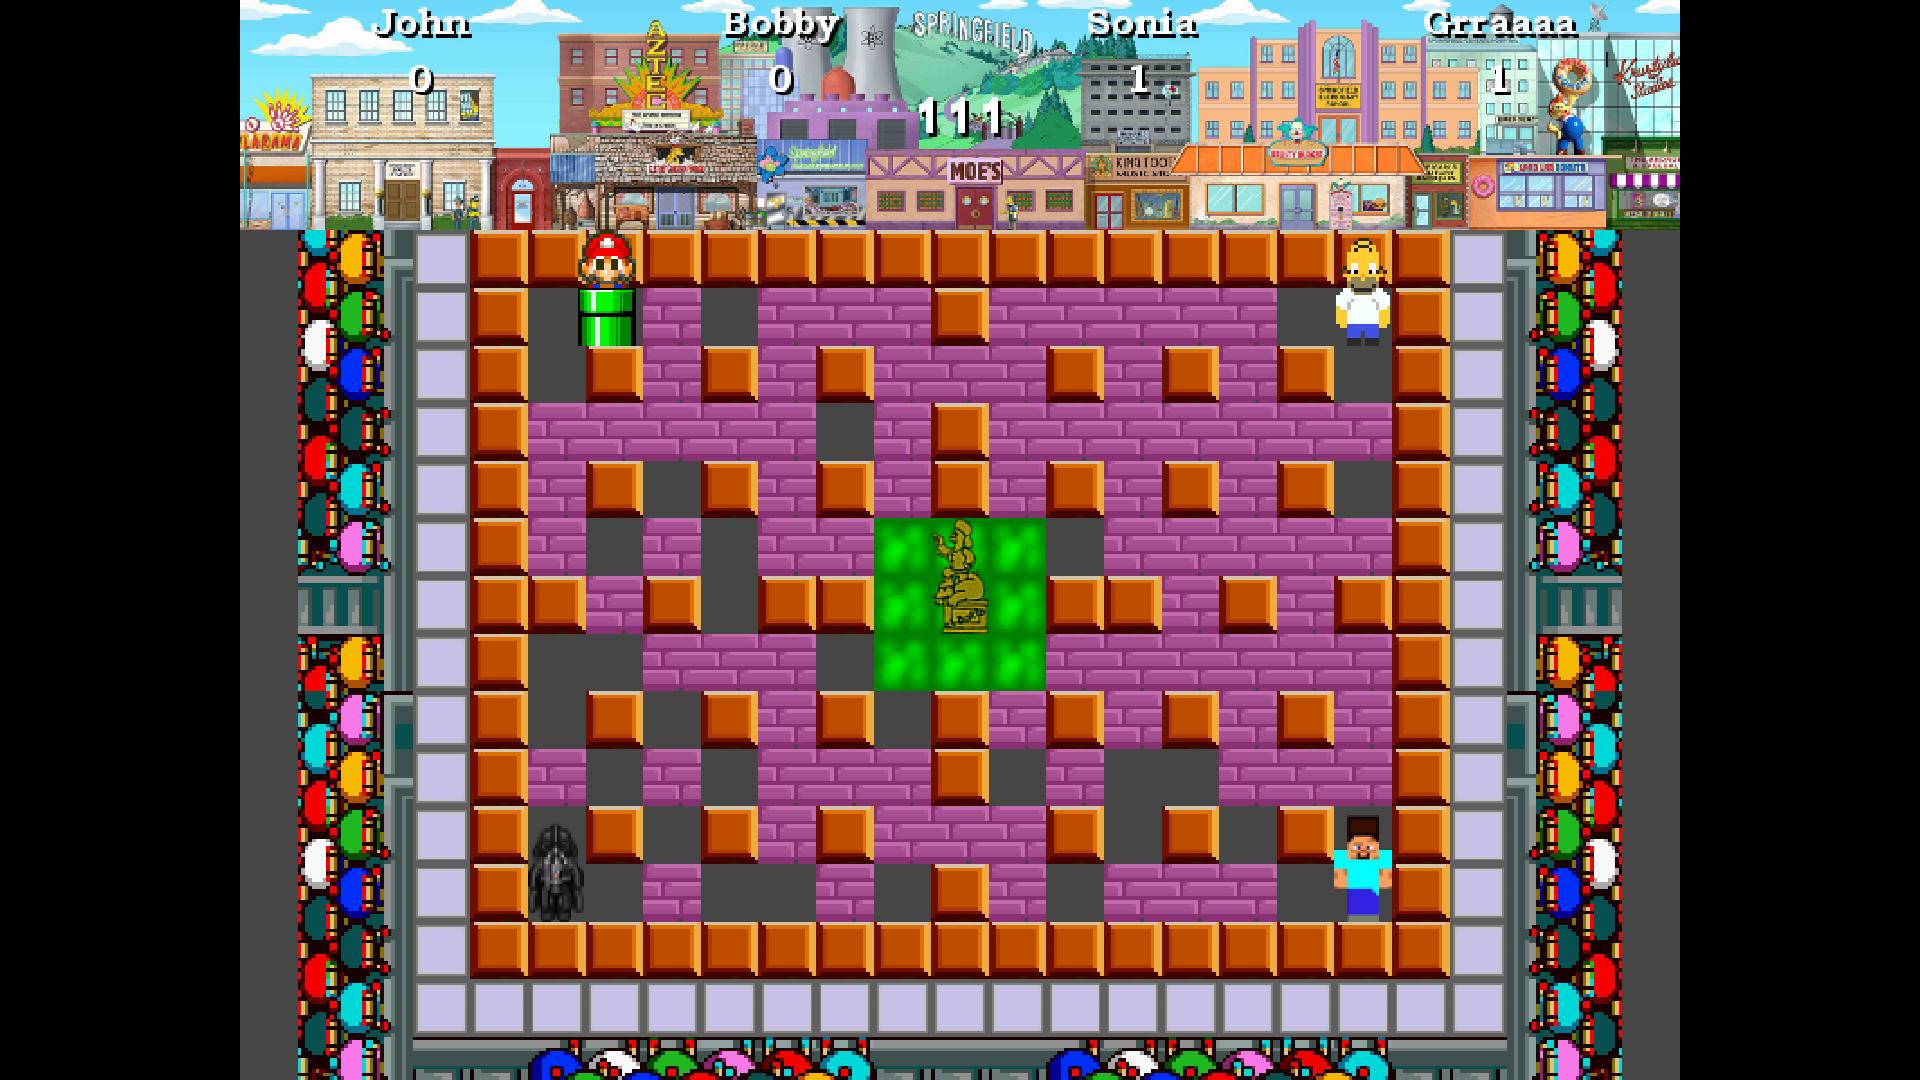 Super BombermouX Xf7xauw3ey8tllnfg